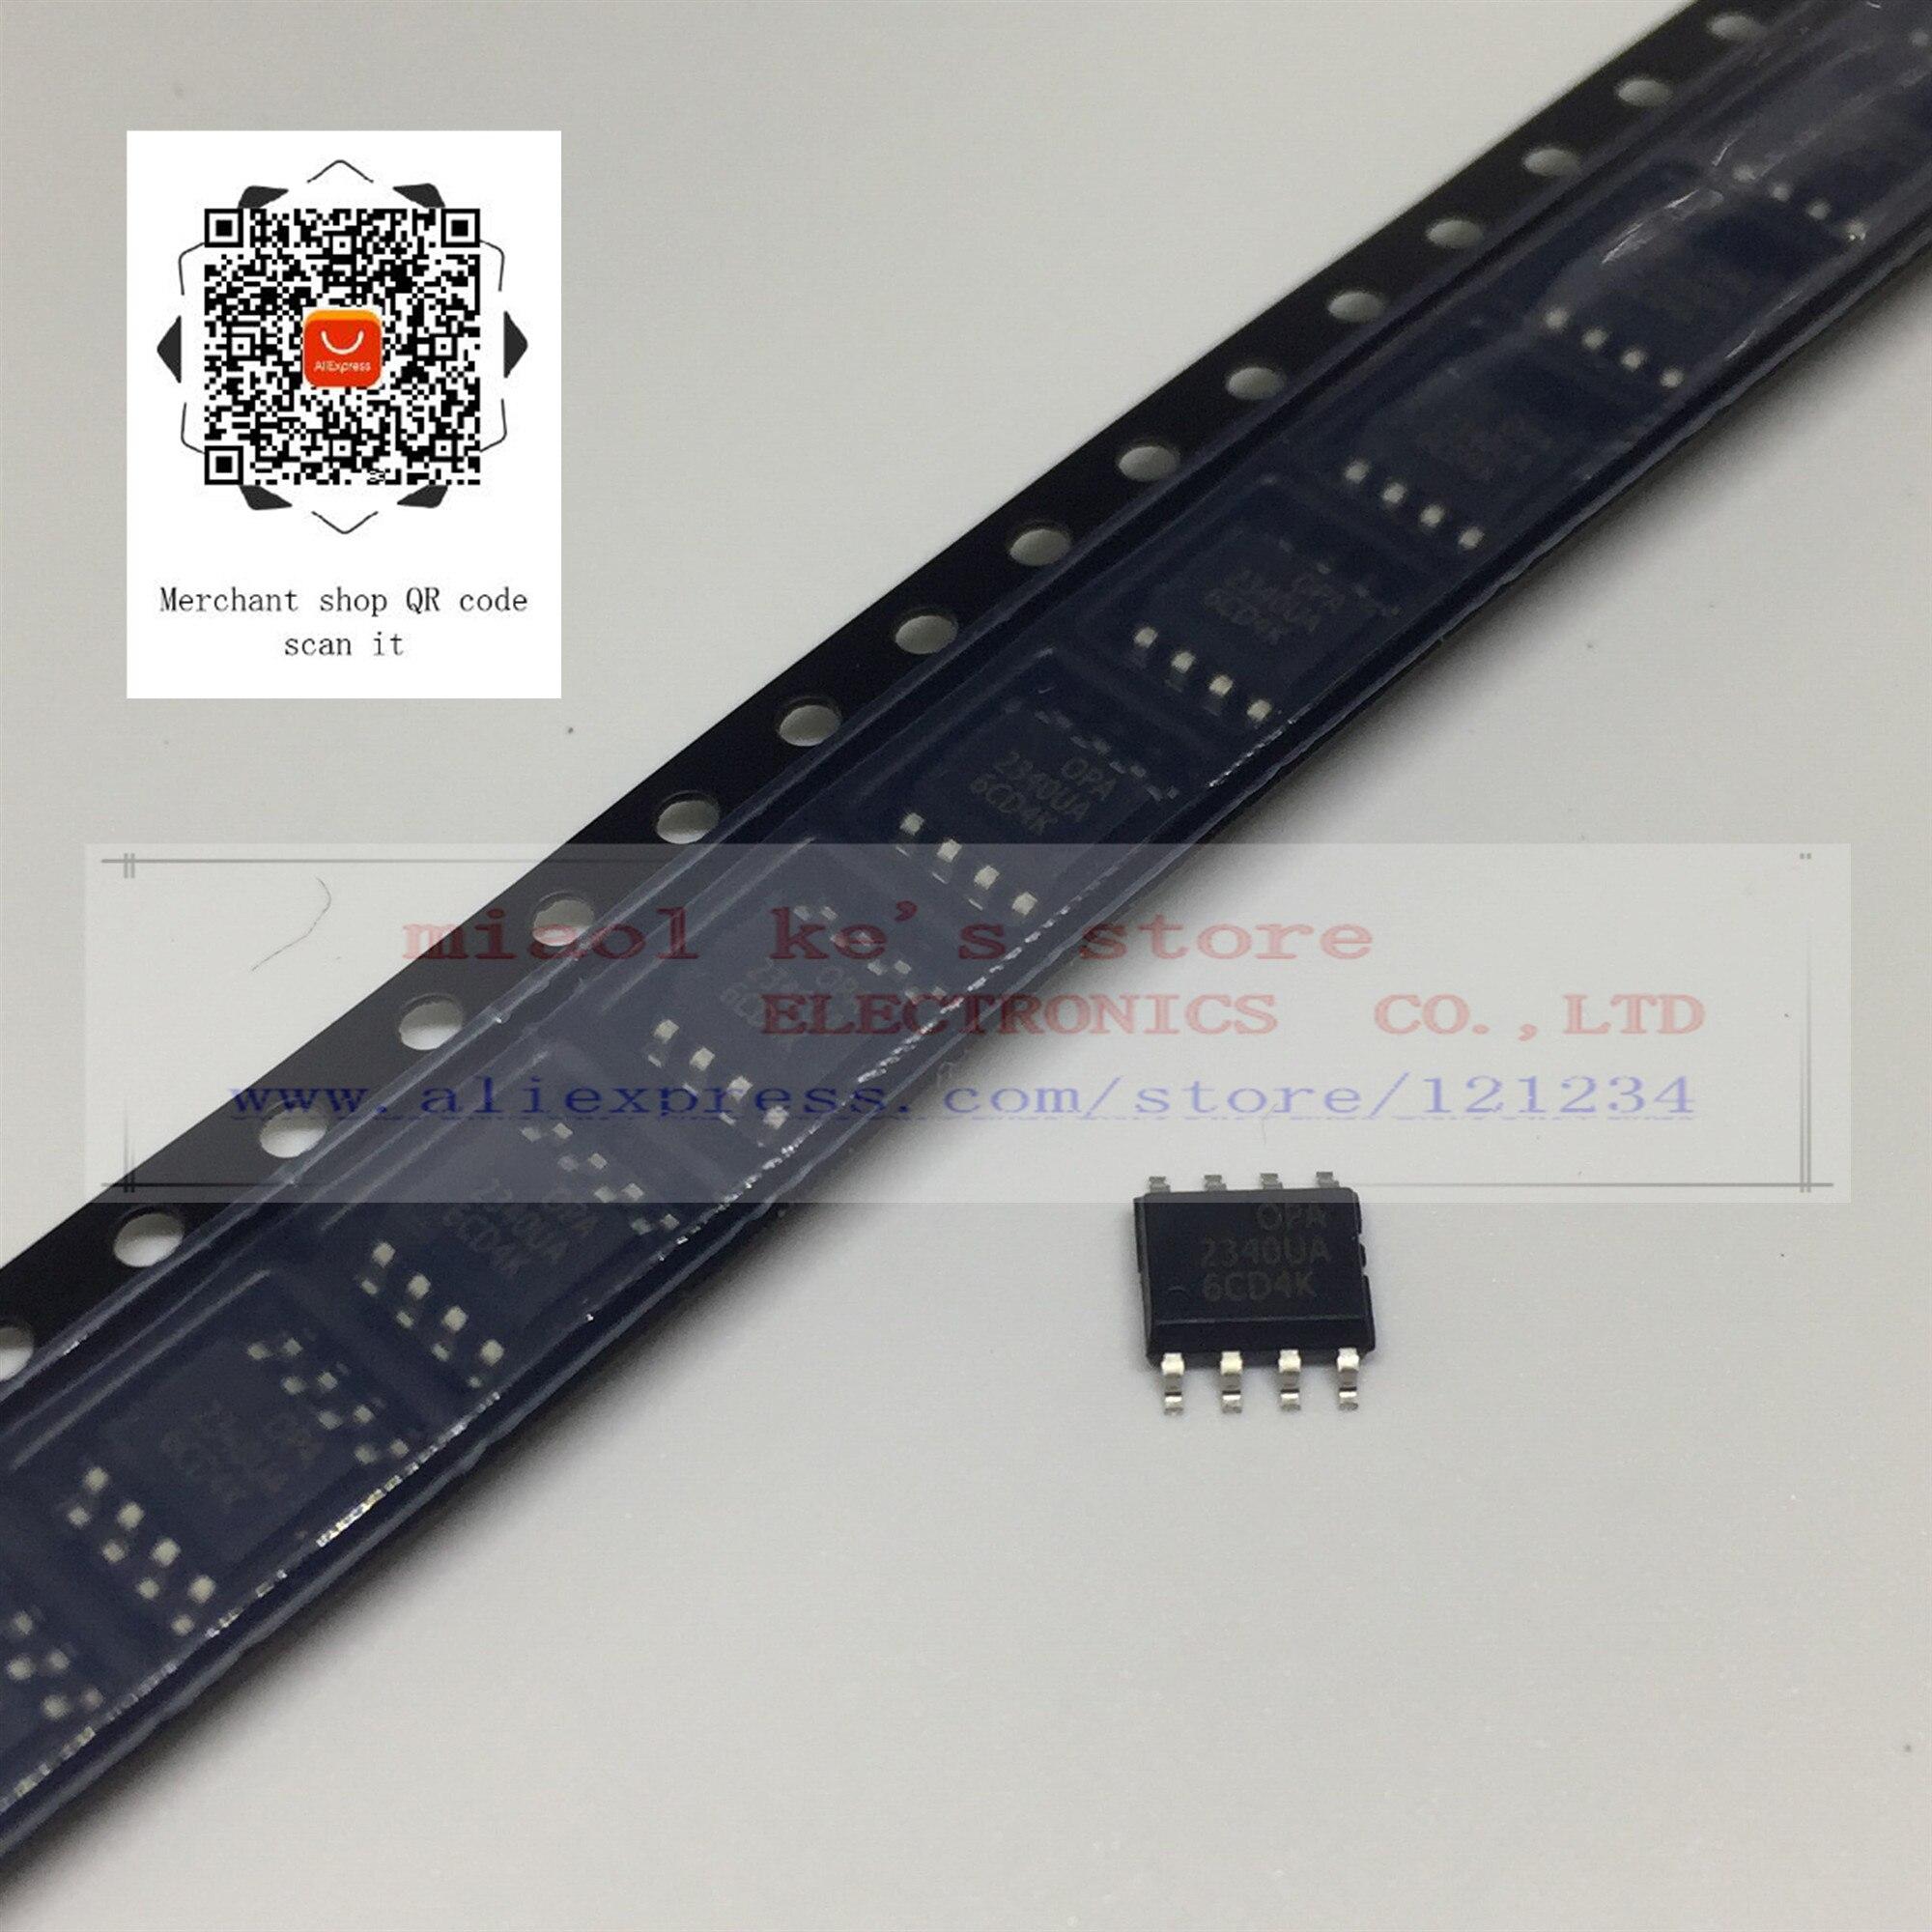 TVS Diodes Transient Voltage Suppressors 1500W 160V Unidirect 100 pieces